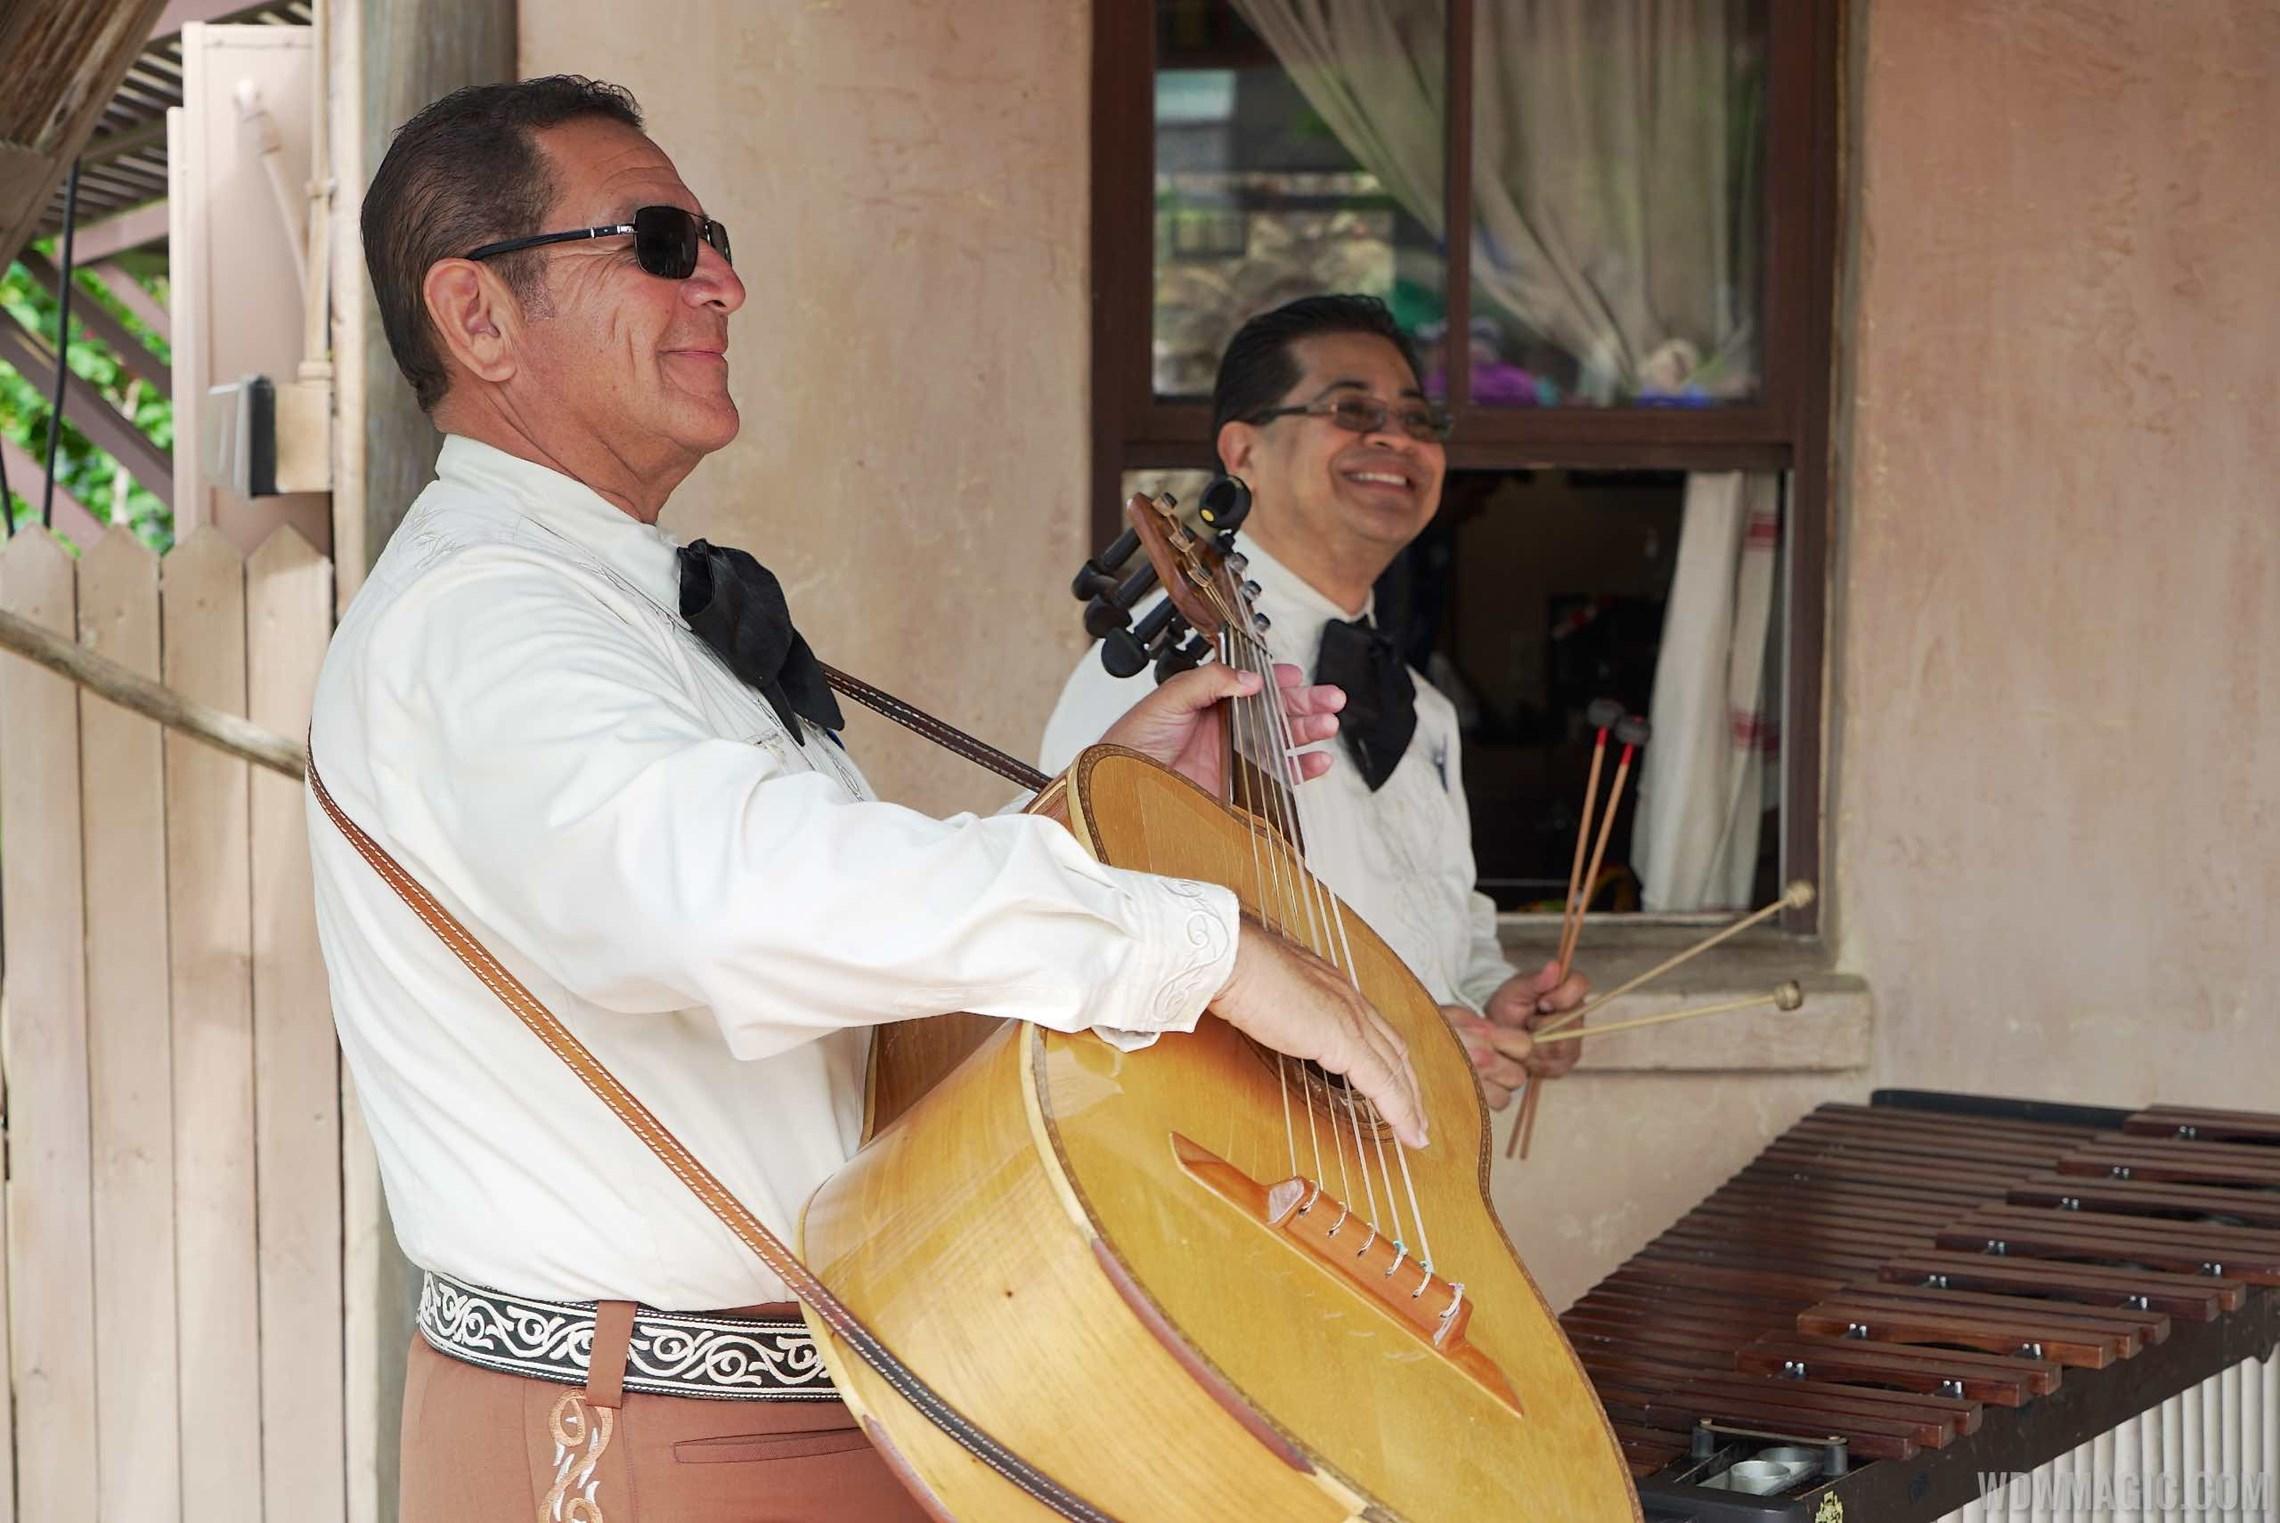 Mexican Marimba Trio performance